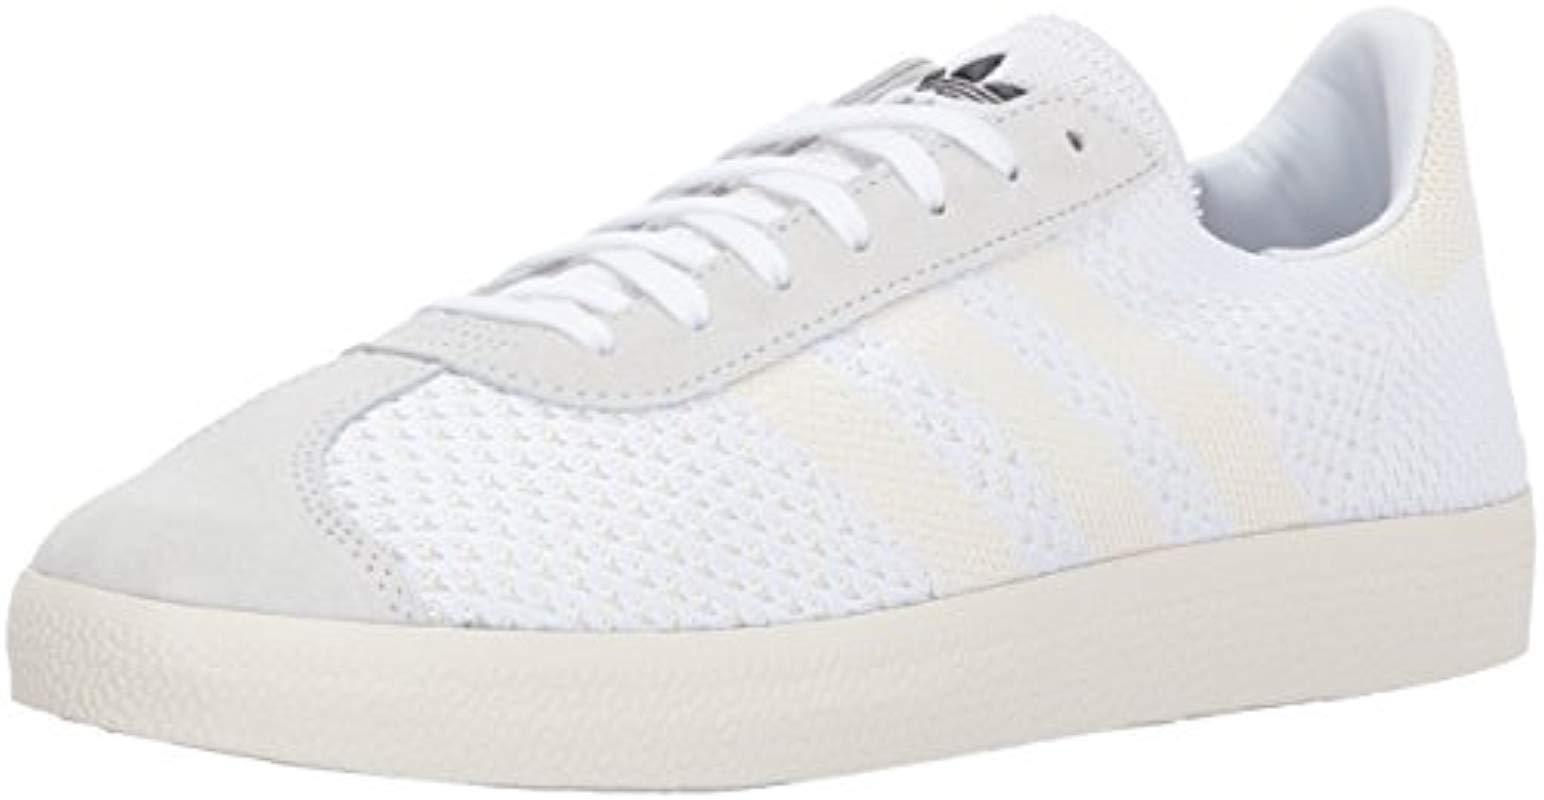 check out 59252 289ab adidas Originals. Mens White Gazelle Pk Sneaker